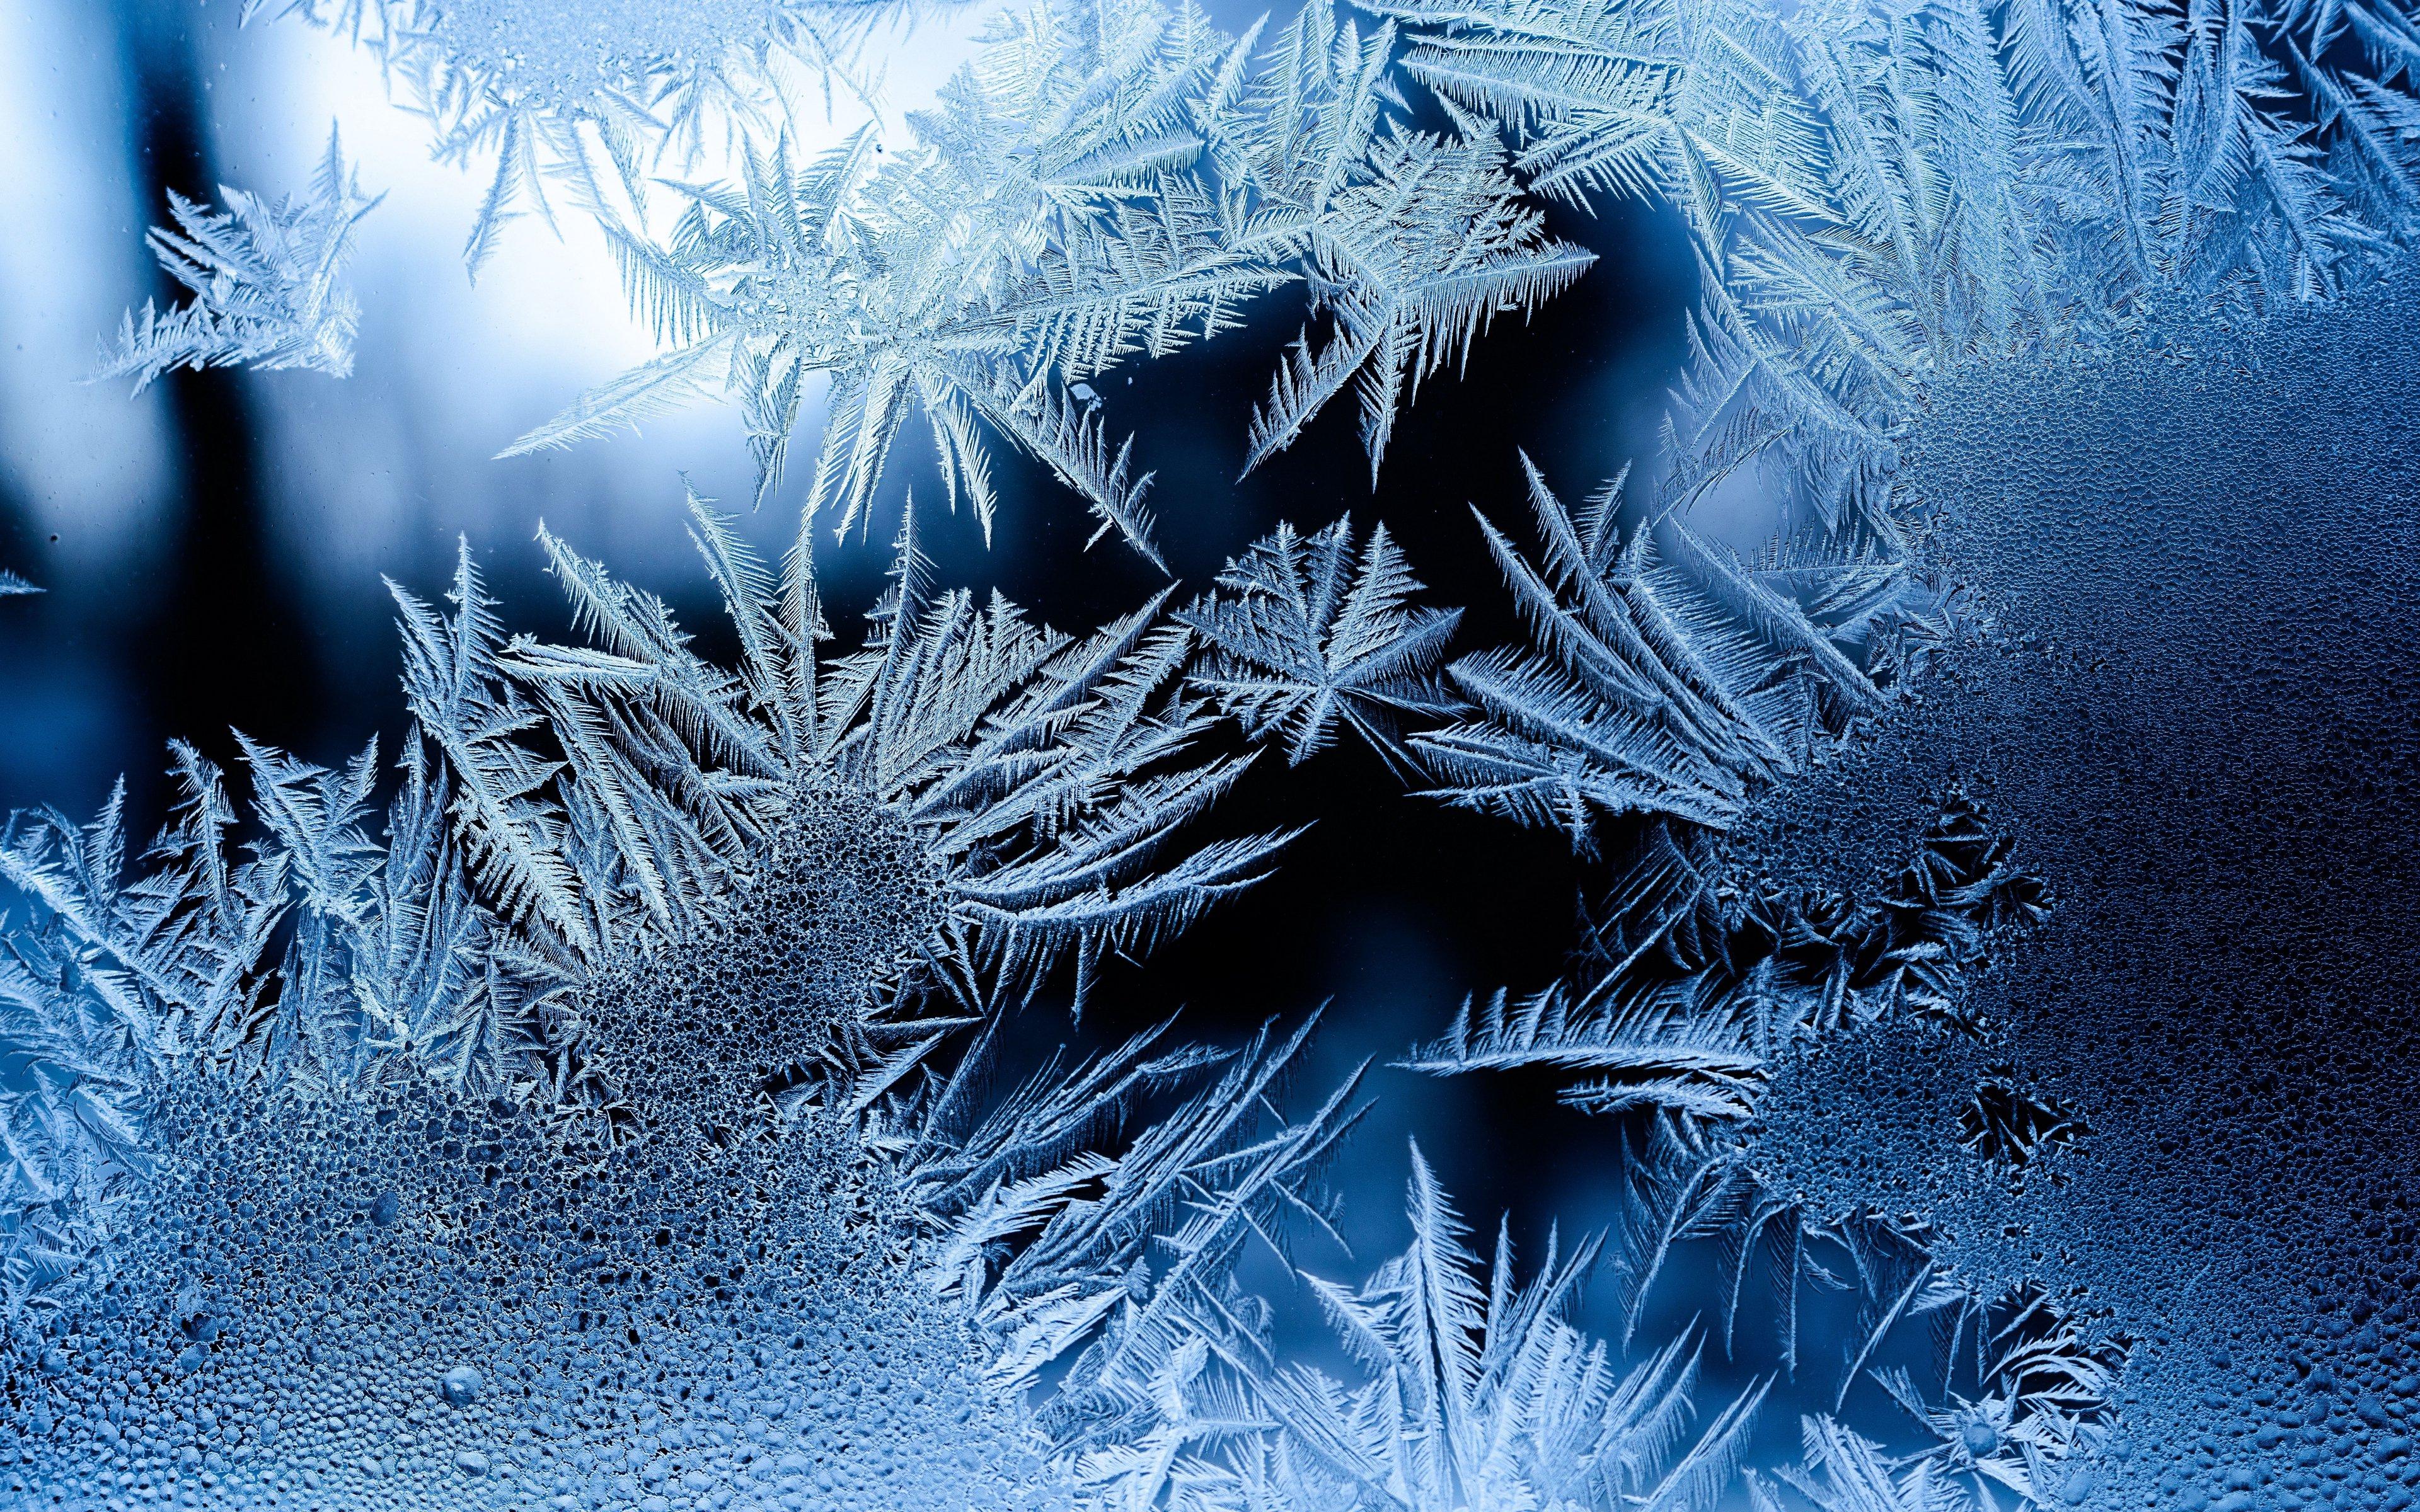 Pattern Of Snowflakes Wallpaper 4k Ultra Hd Id3837